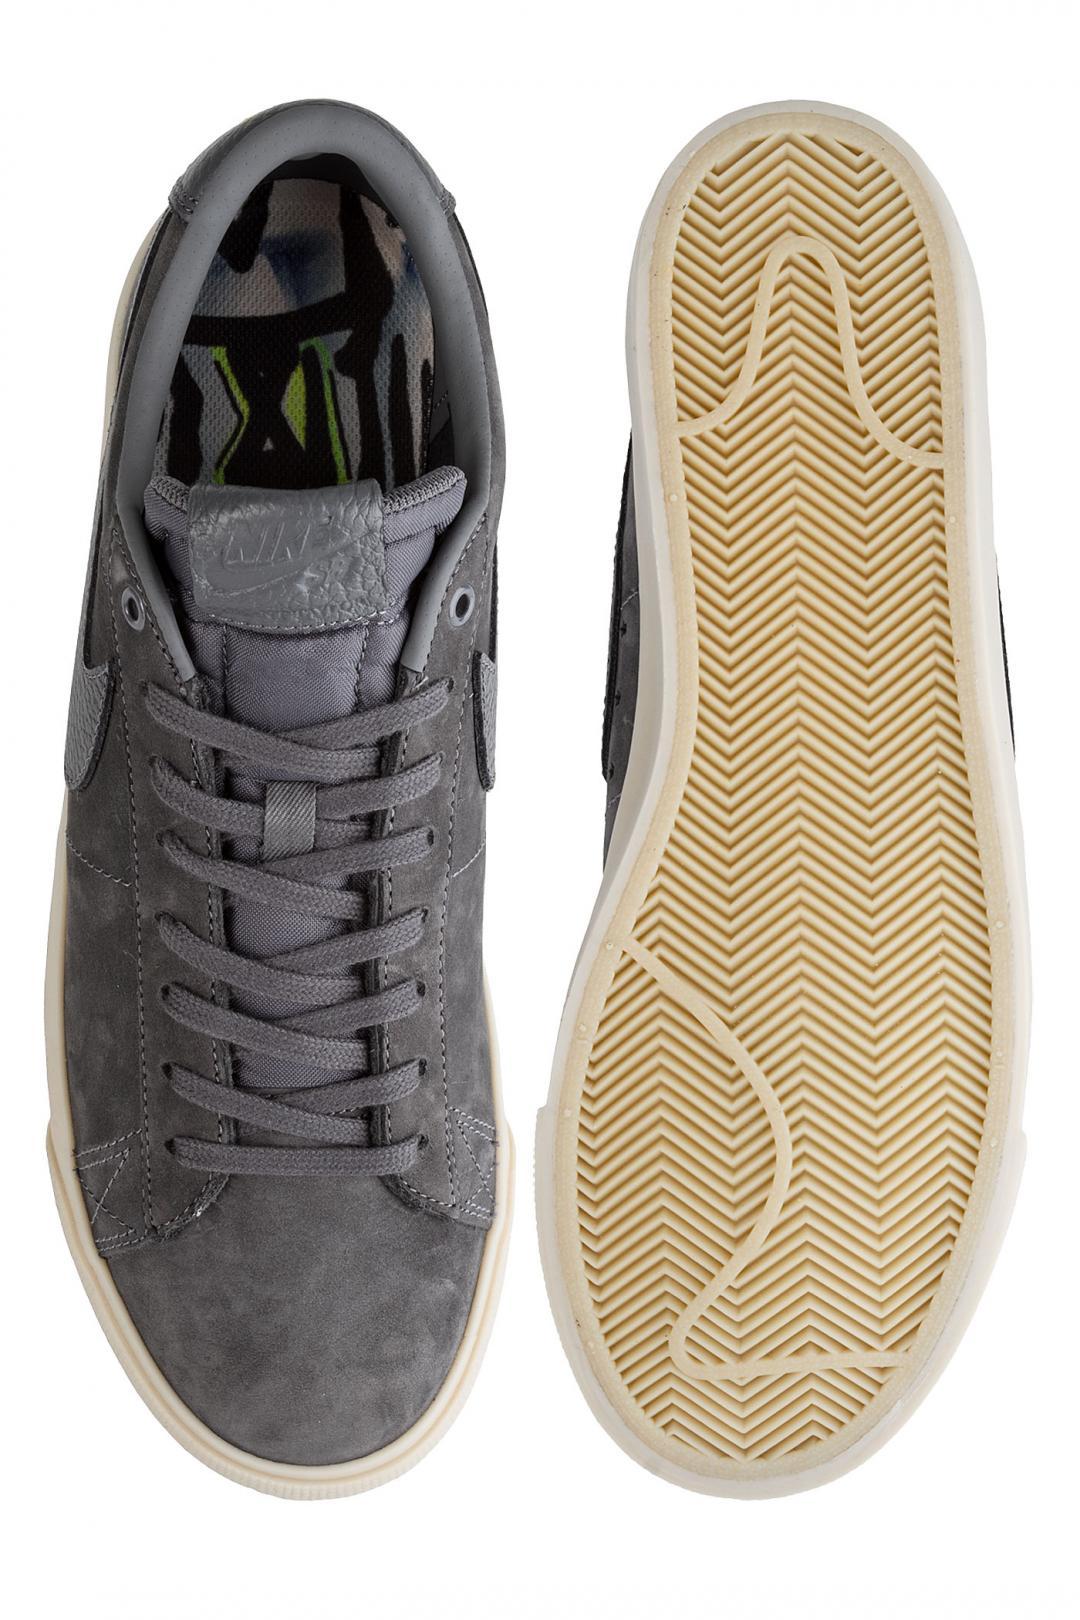 Uomo Nike SB x Anti Hero Blazer Low Grant Taylor QS dark grey | Sneakers low top